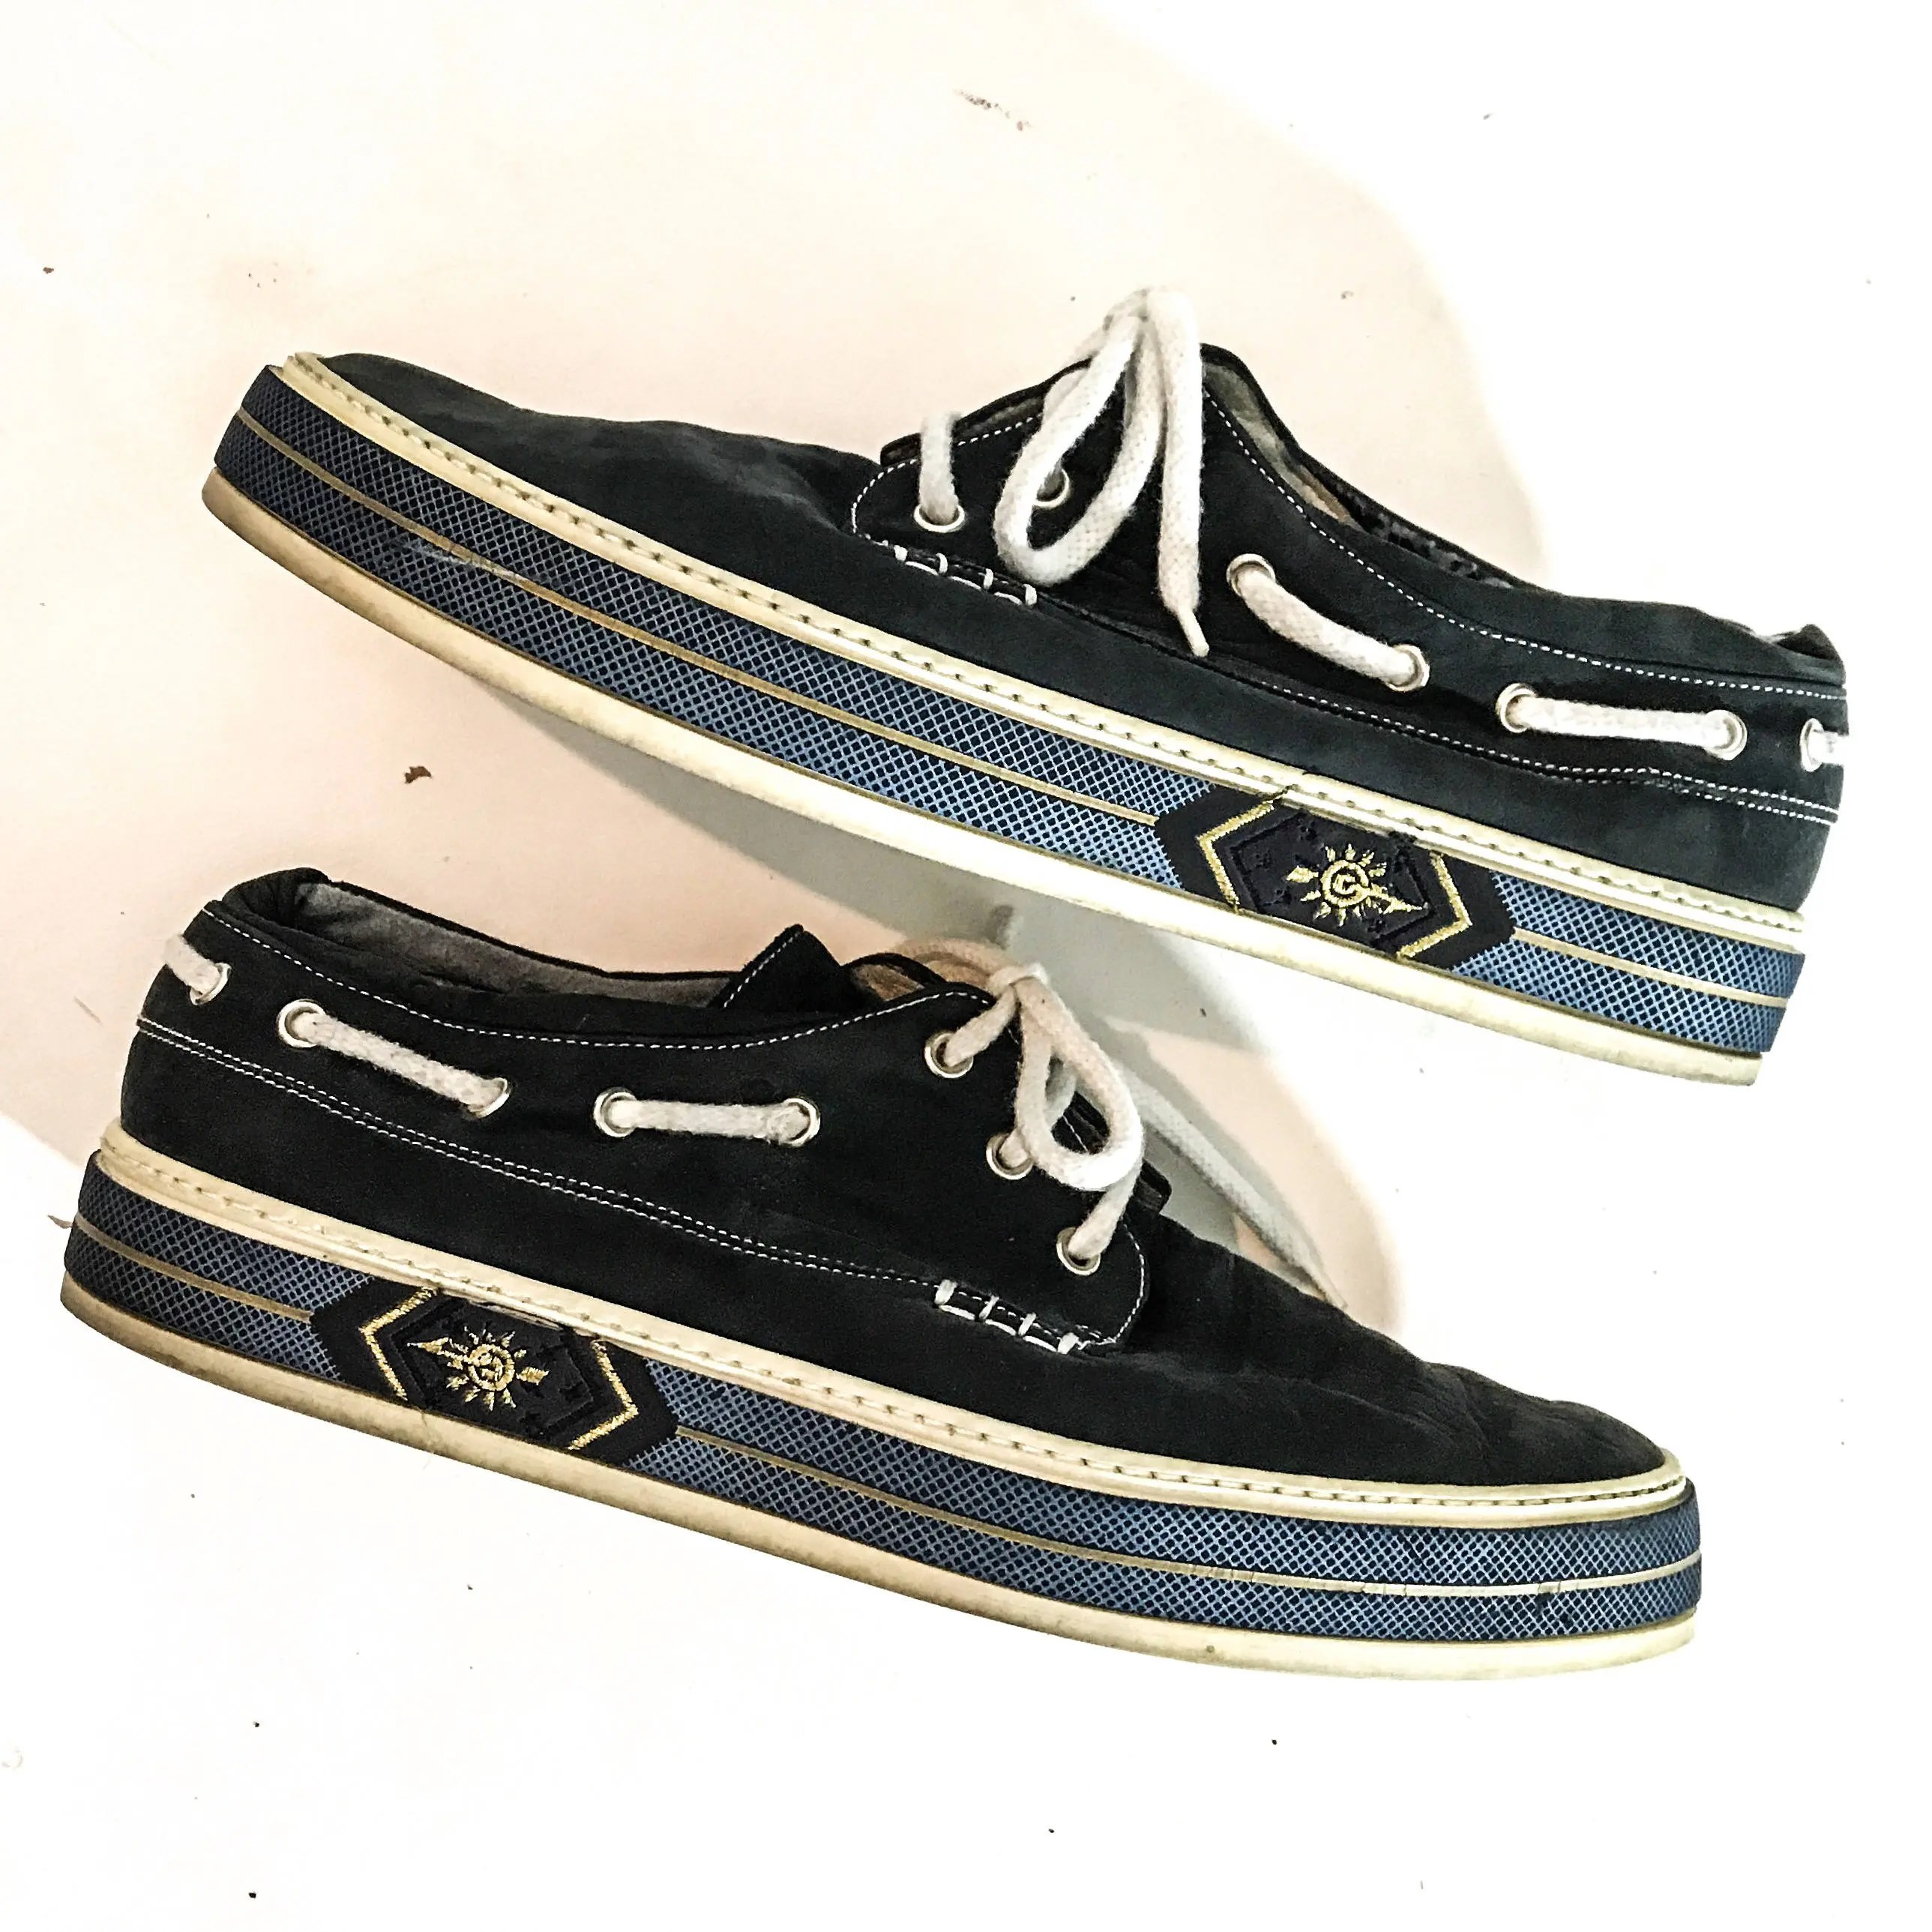 90s Vintage Clothing Bally Mens Shoes Bally Shoes Men Bally